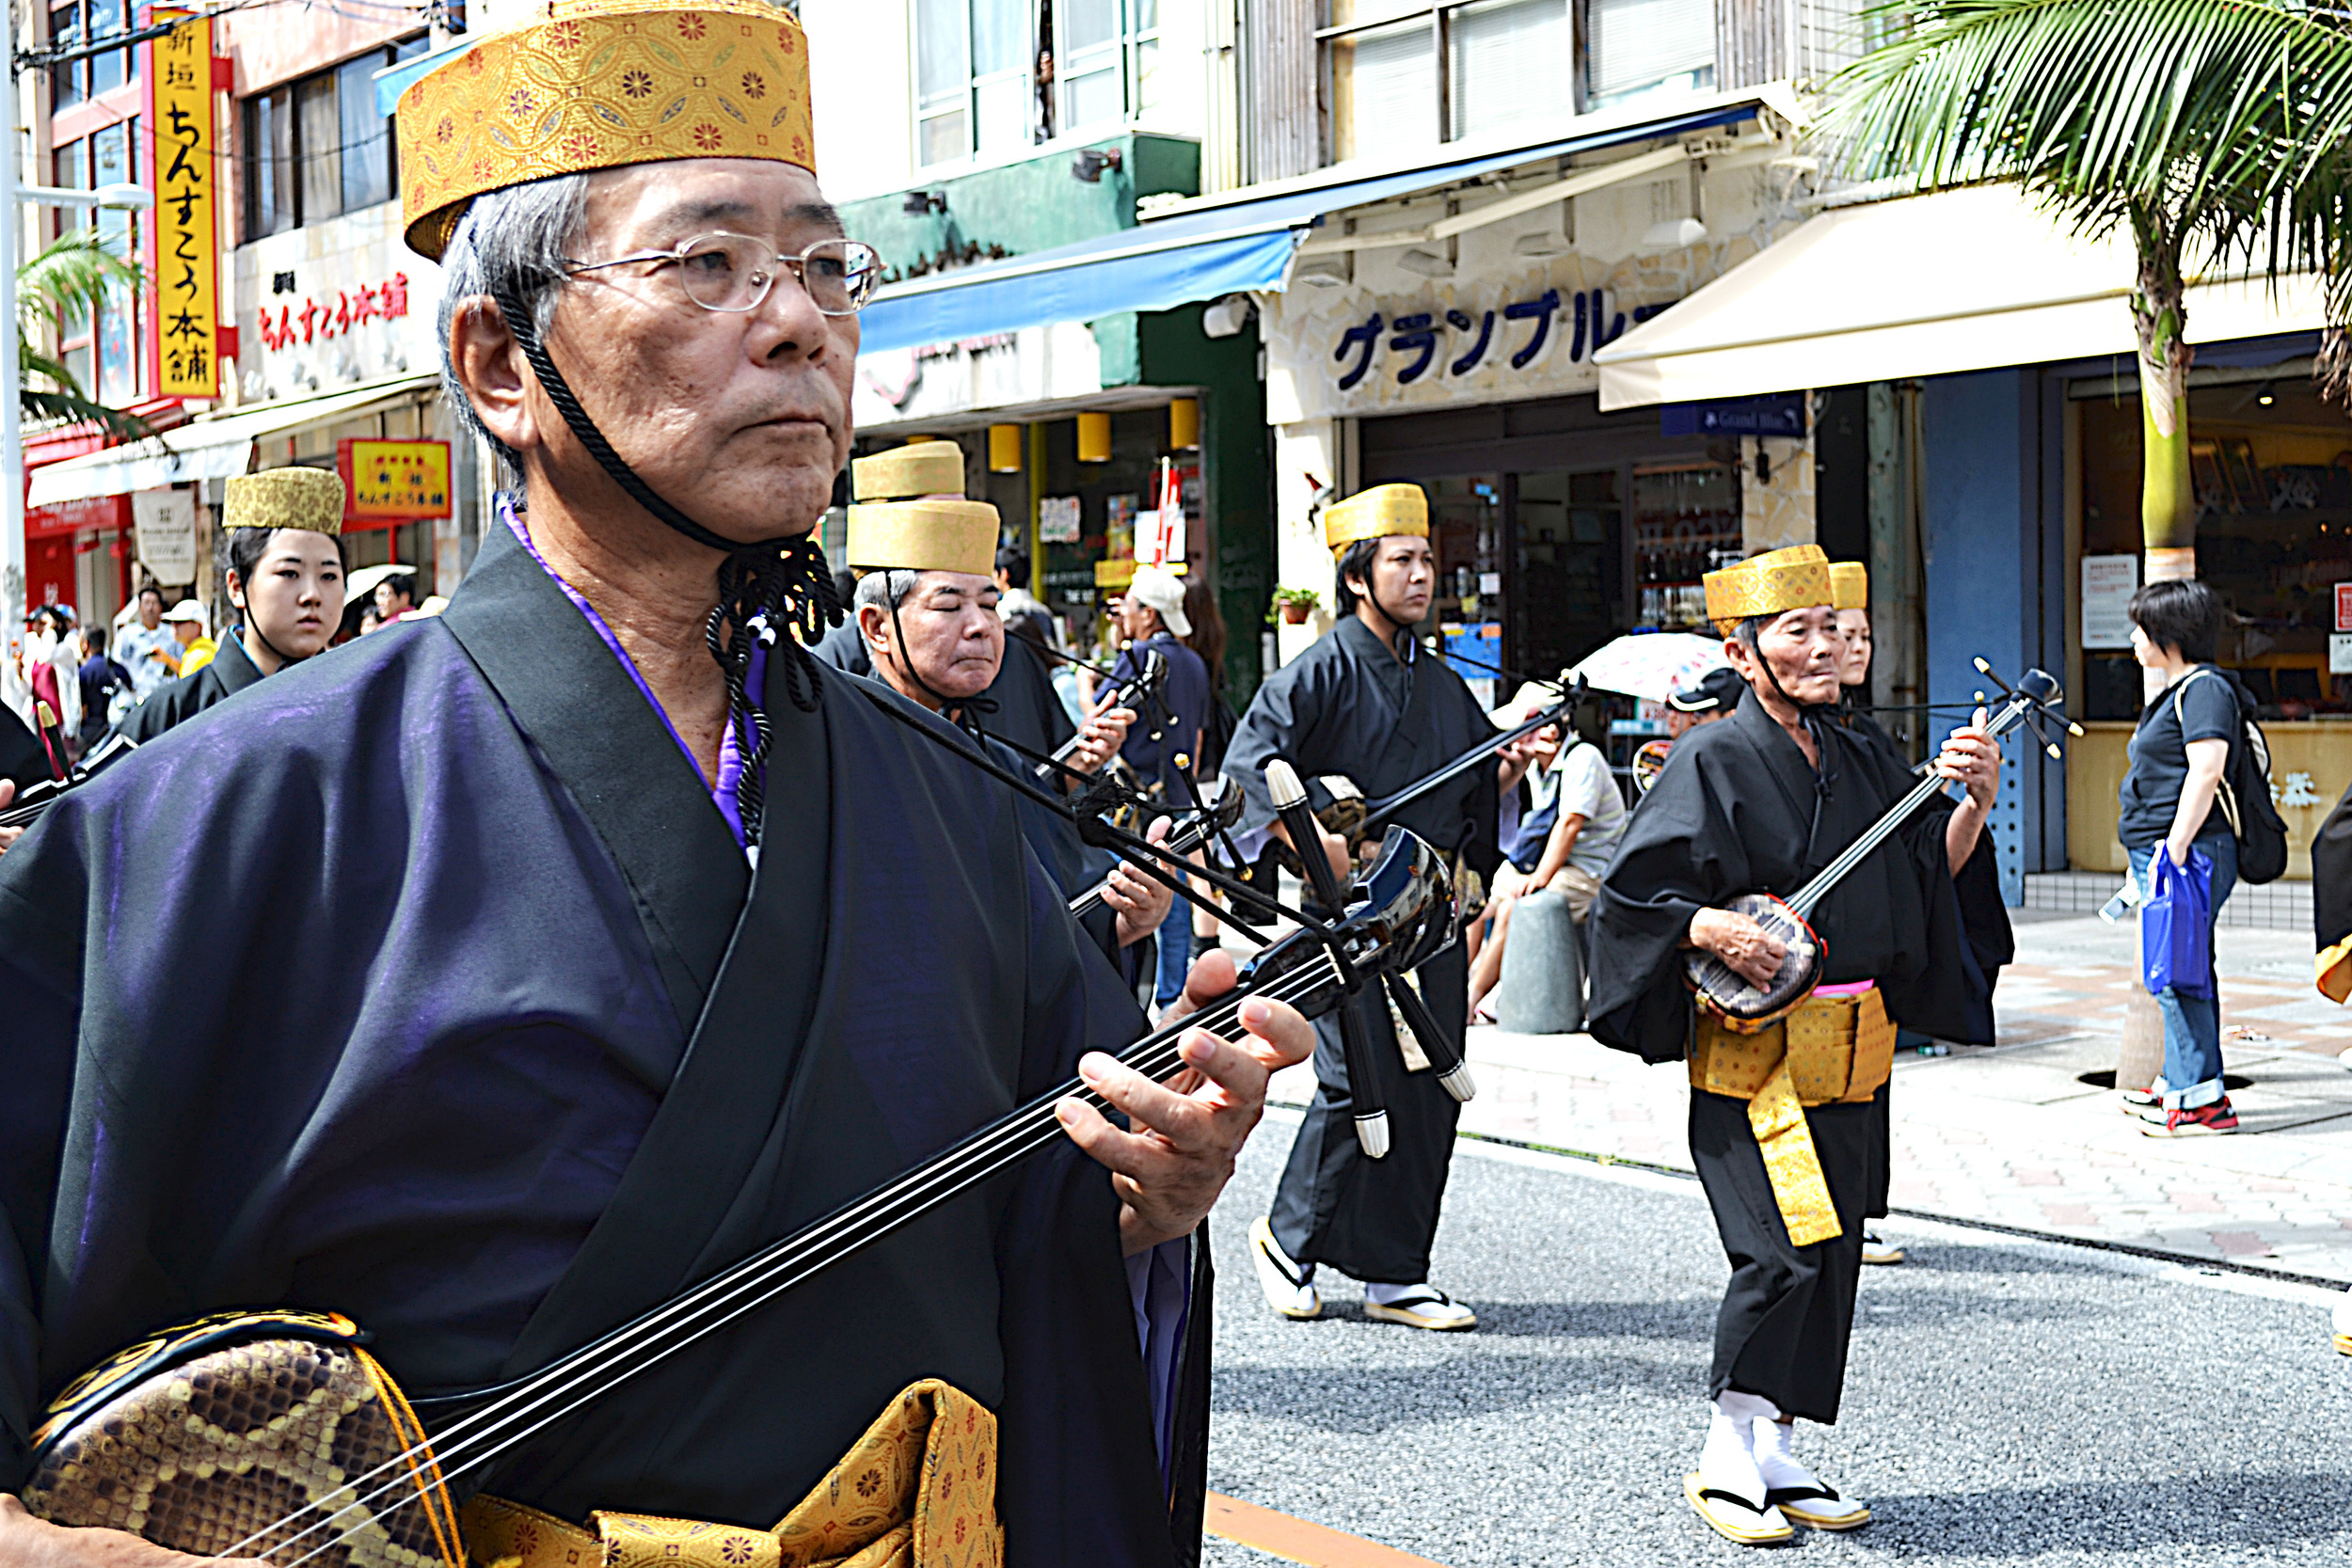 Sanshin, el instrumento tradicional de Okinawa.